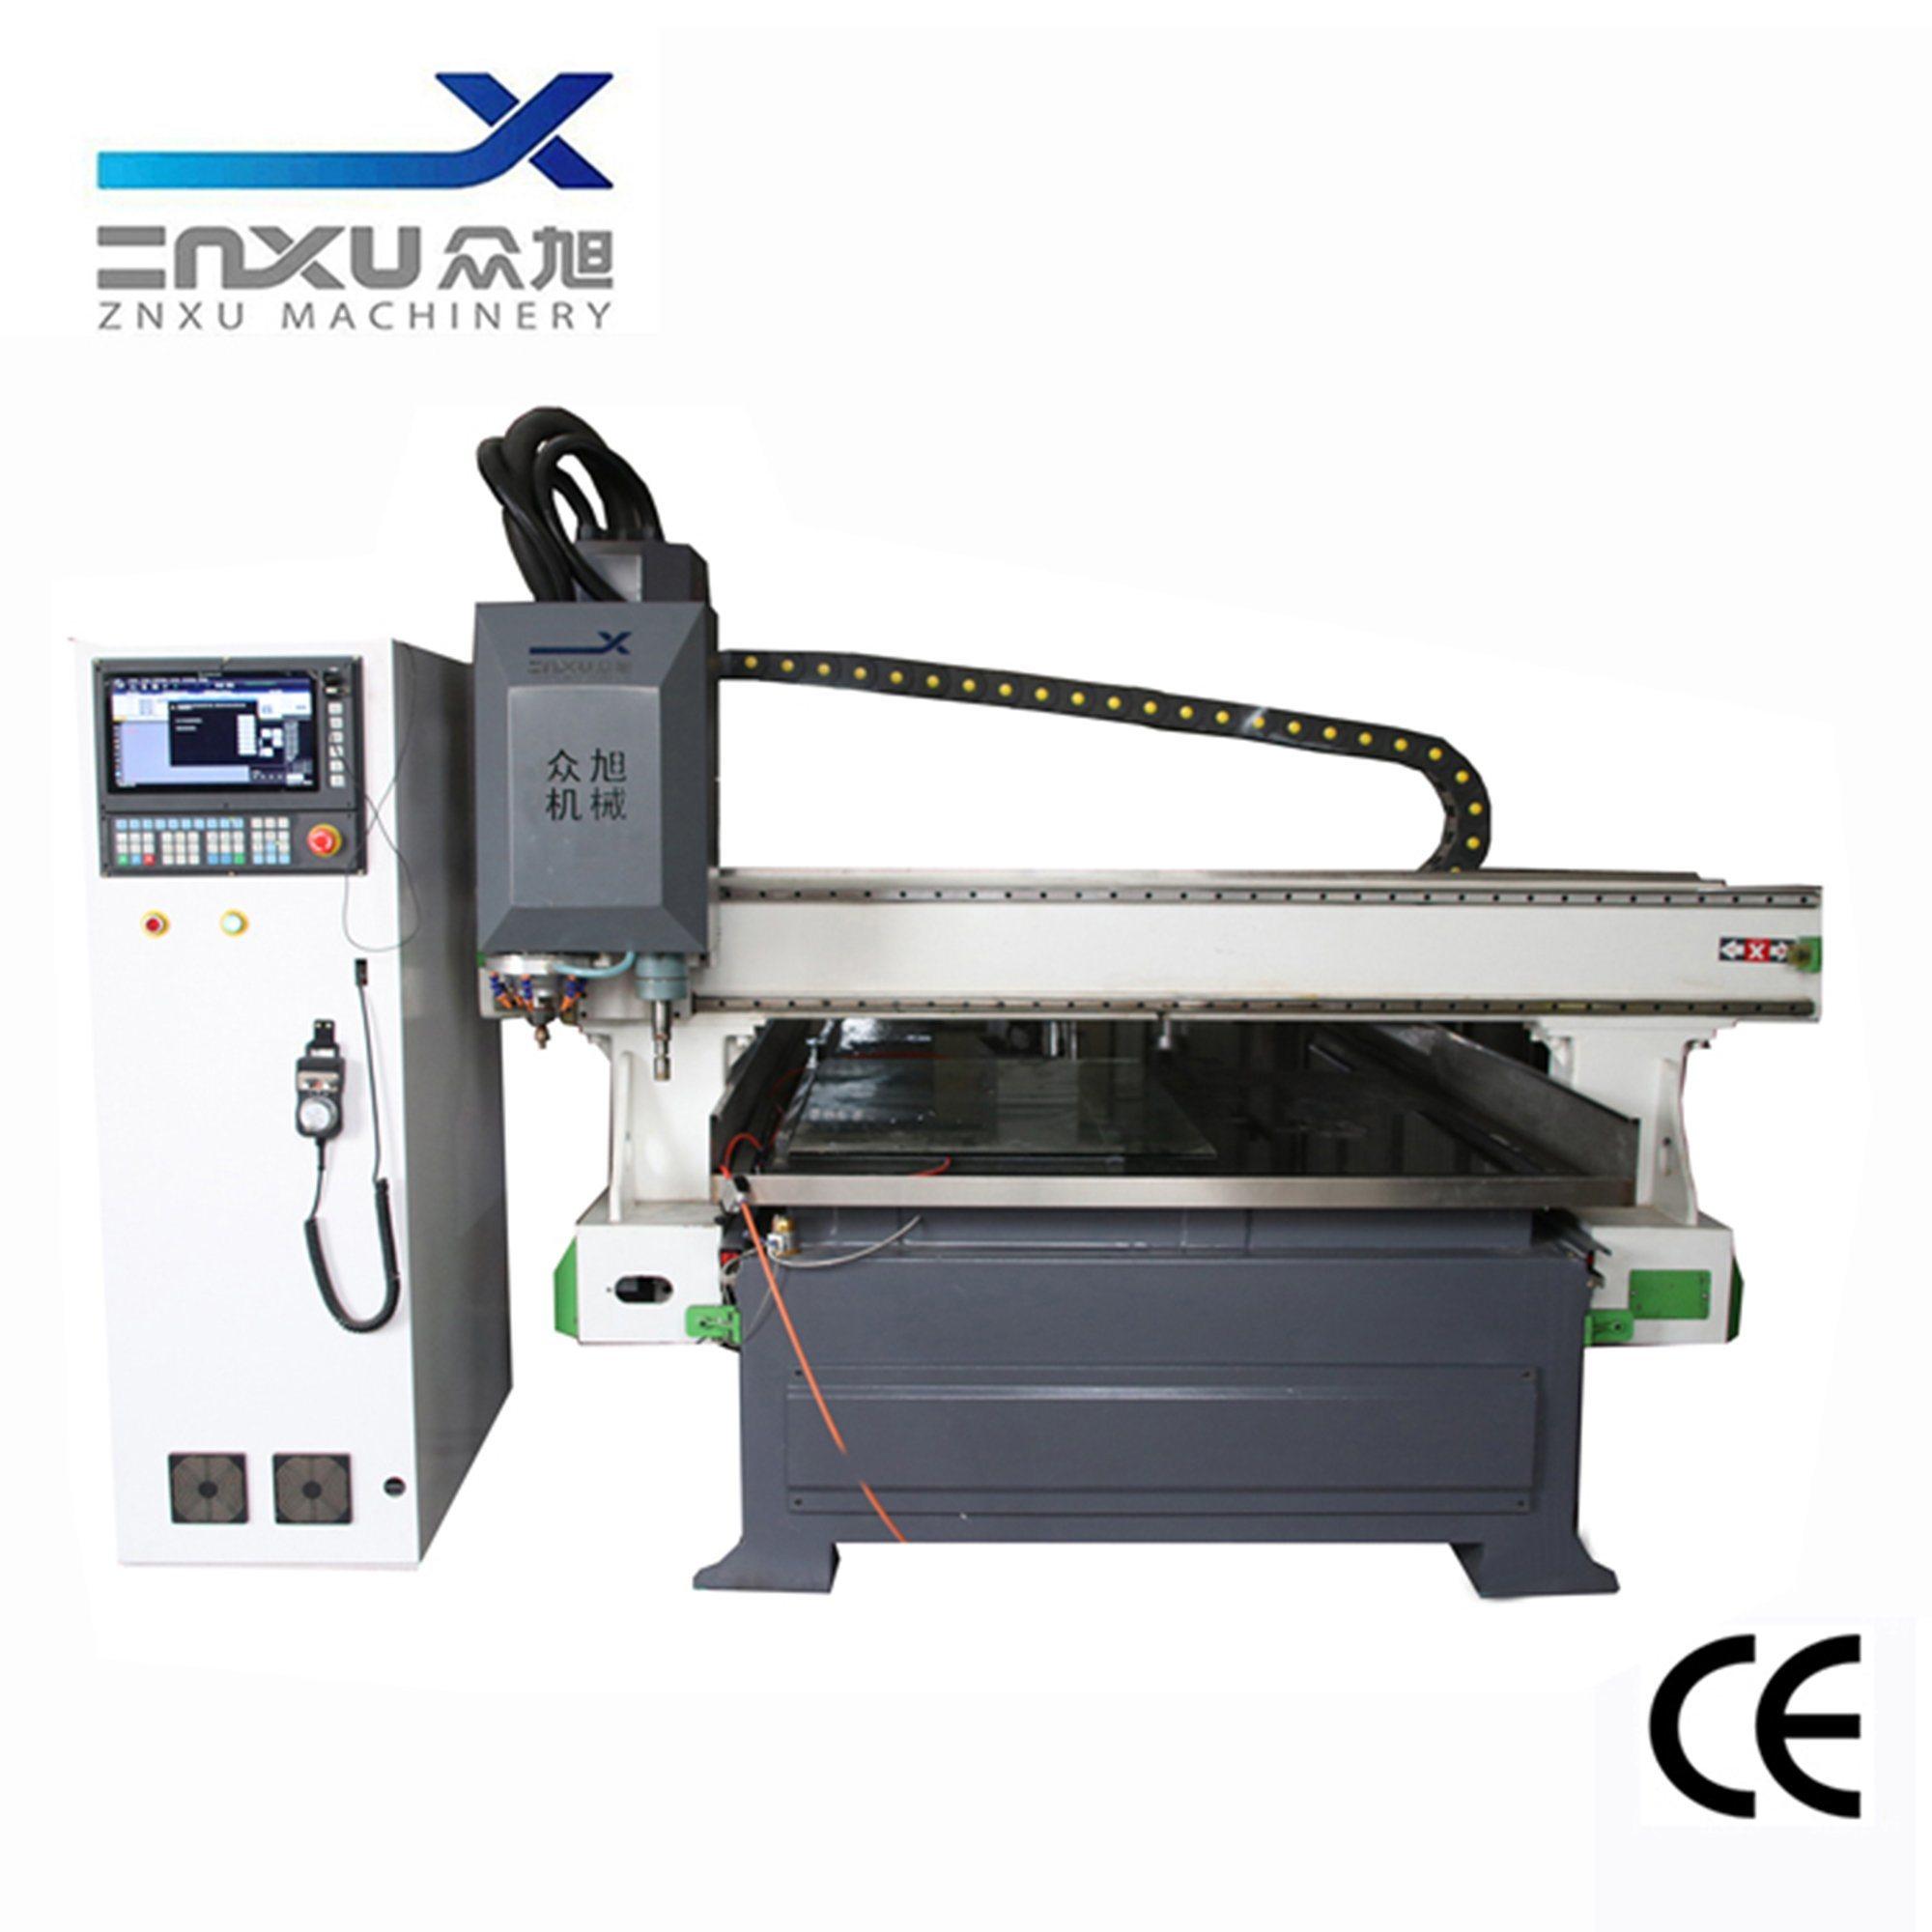 China Zxx 1325b Cnc Glass Notching Machine For Glass Door Clamp